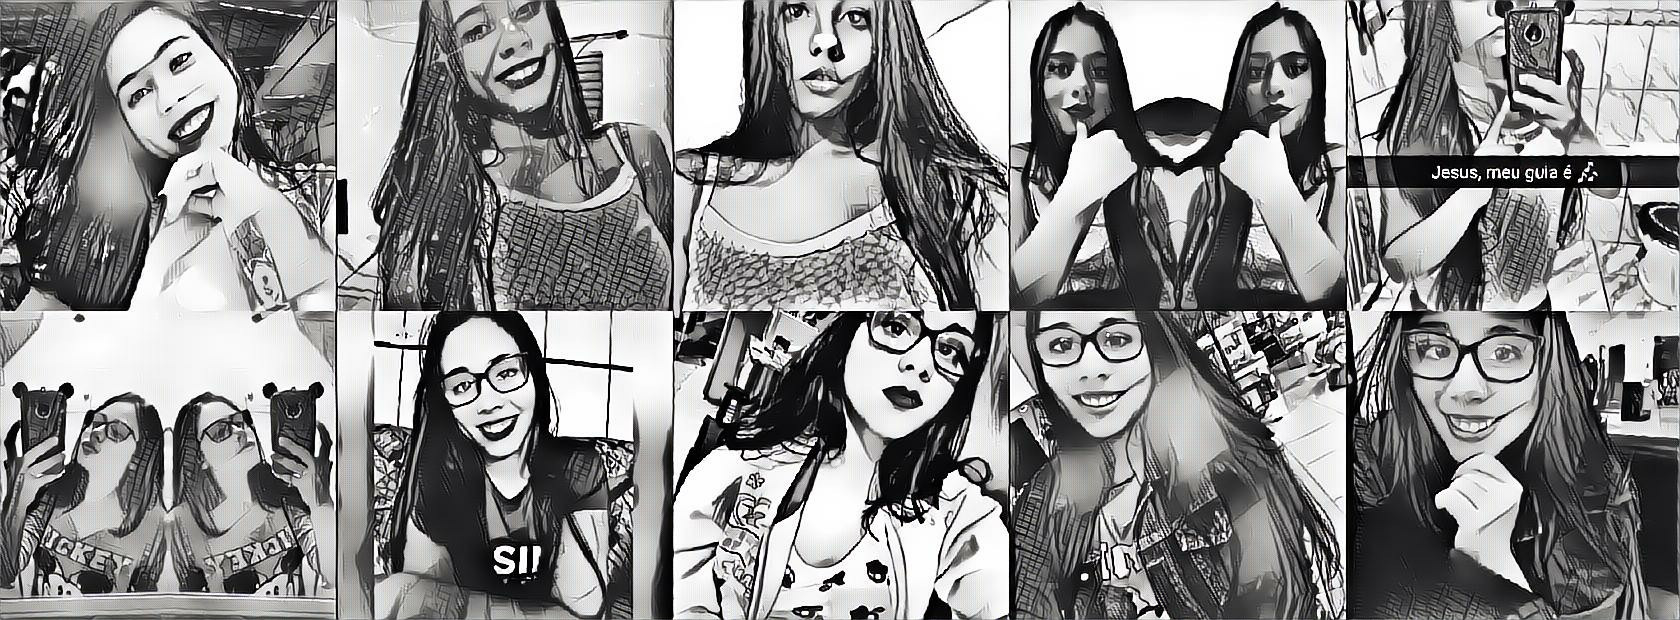 #artistc #cute #selfie #freetoedit